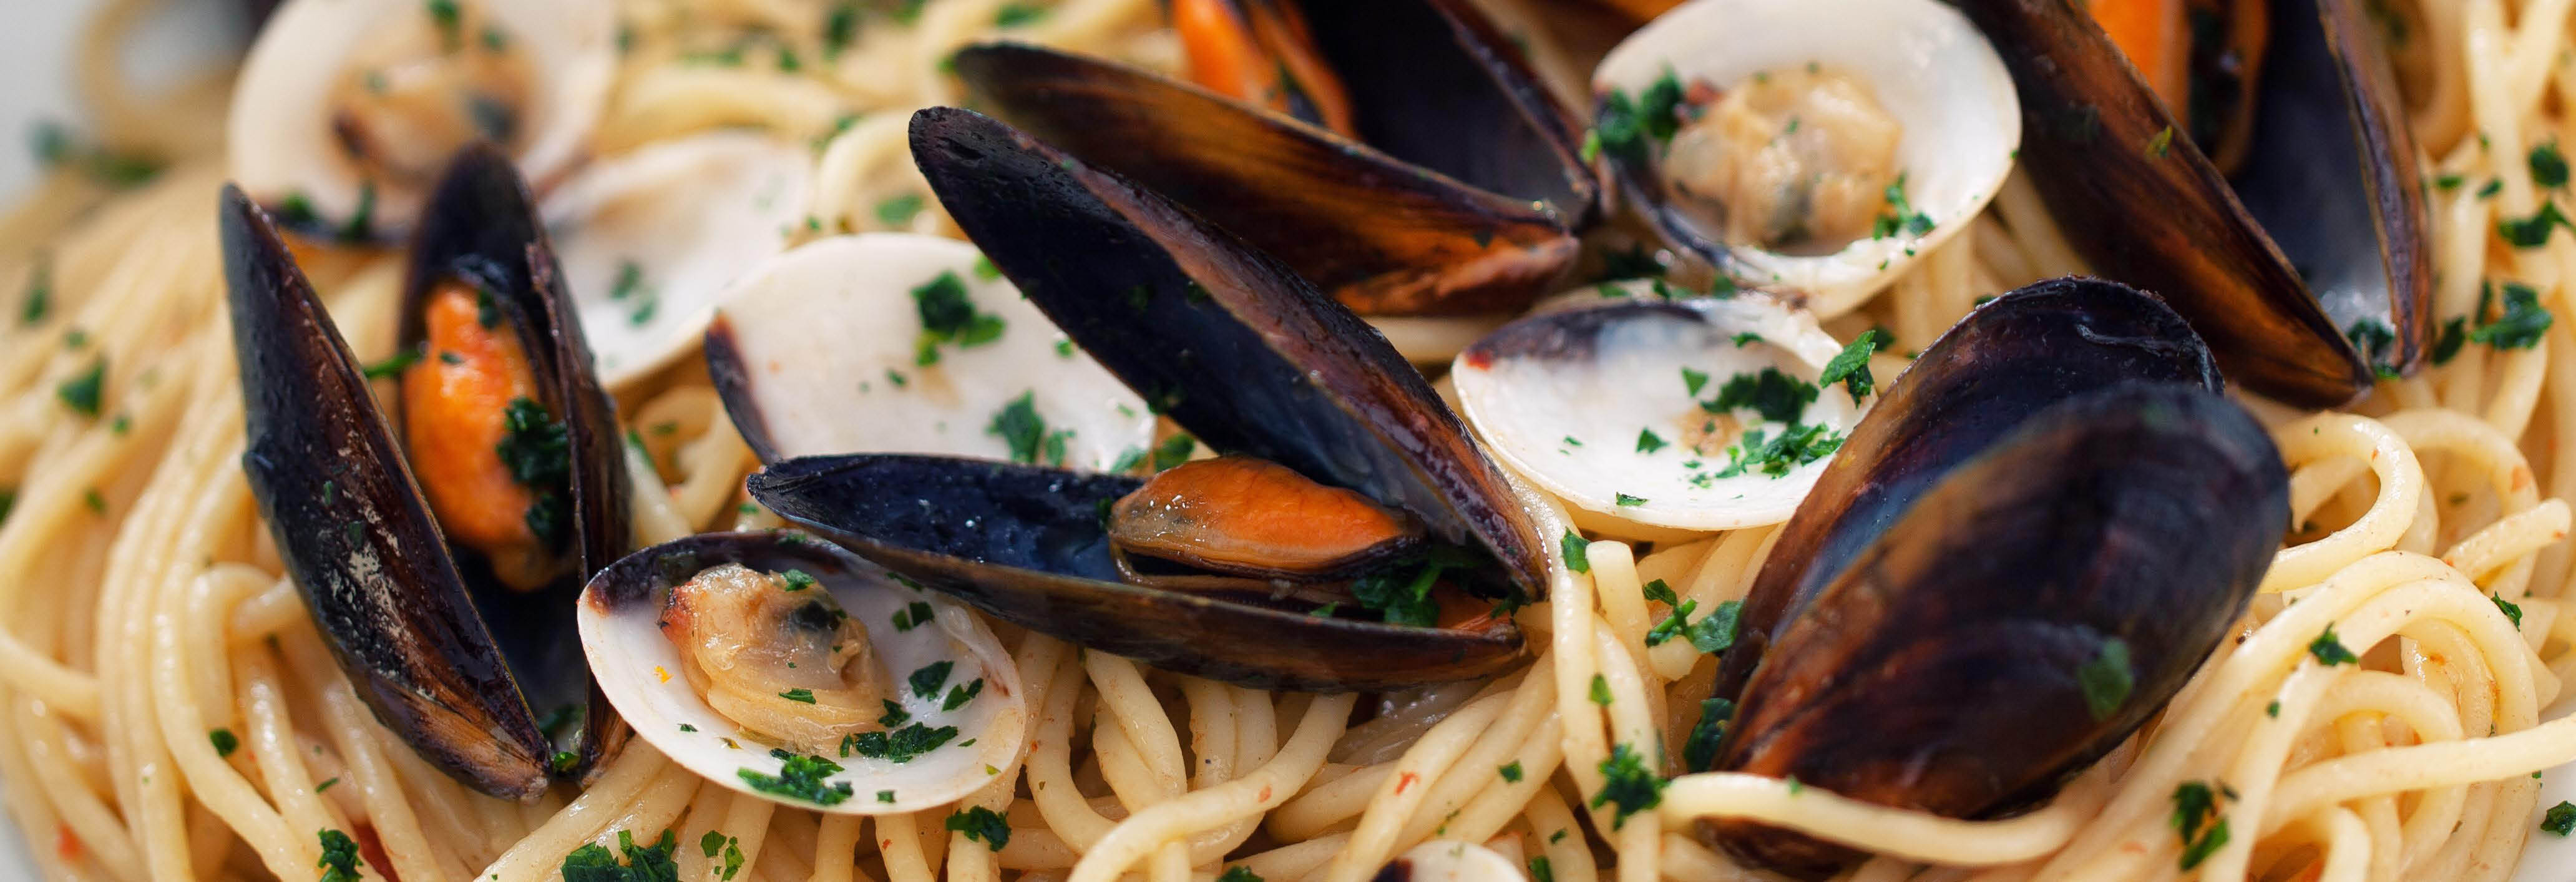 wesos italian restaurant and bar, italian, italian coupon, seafood, steak, hoagies, bar, beer, wine